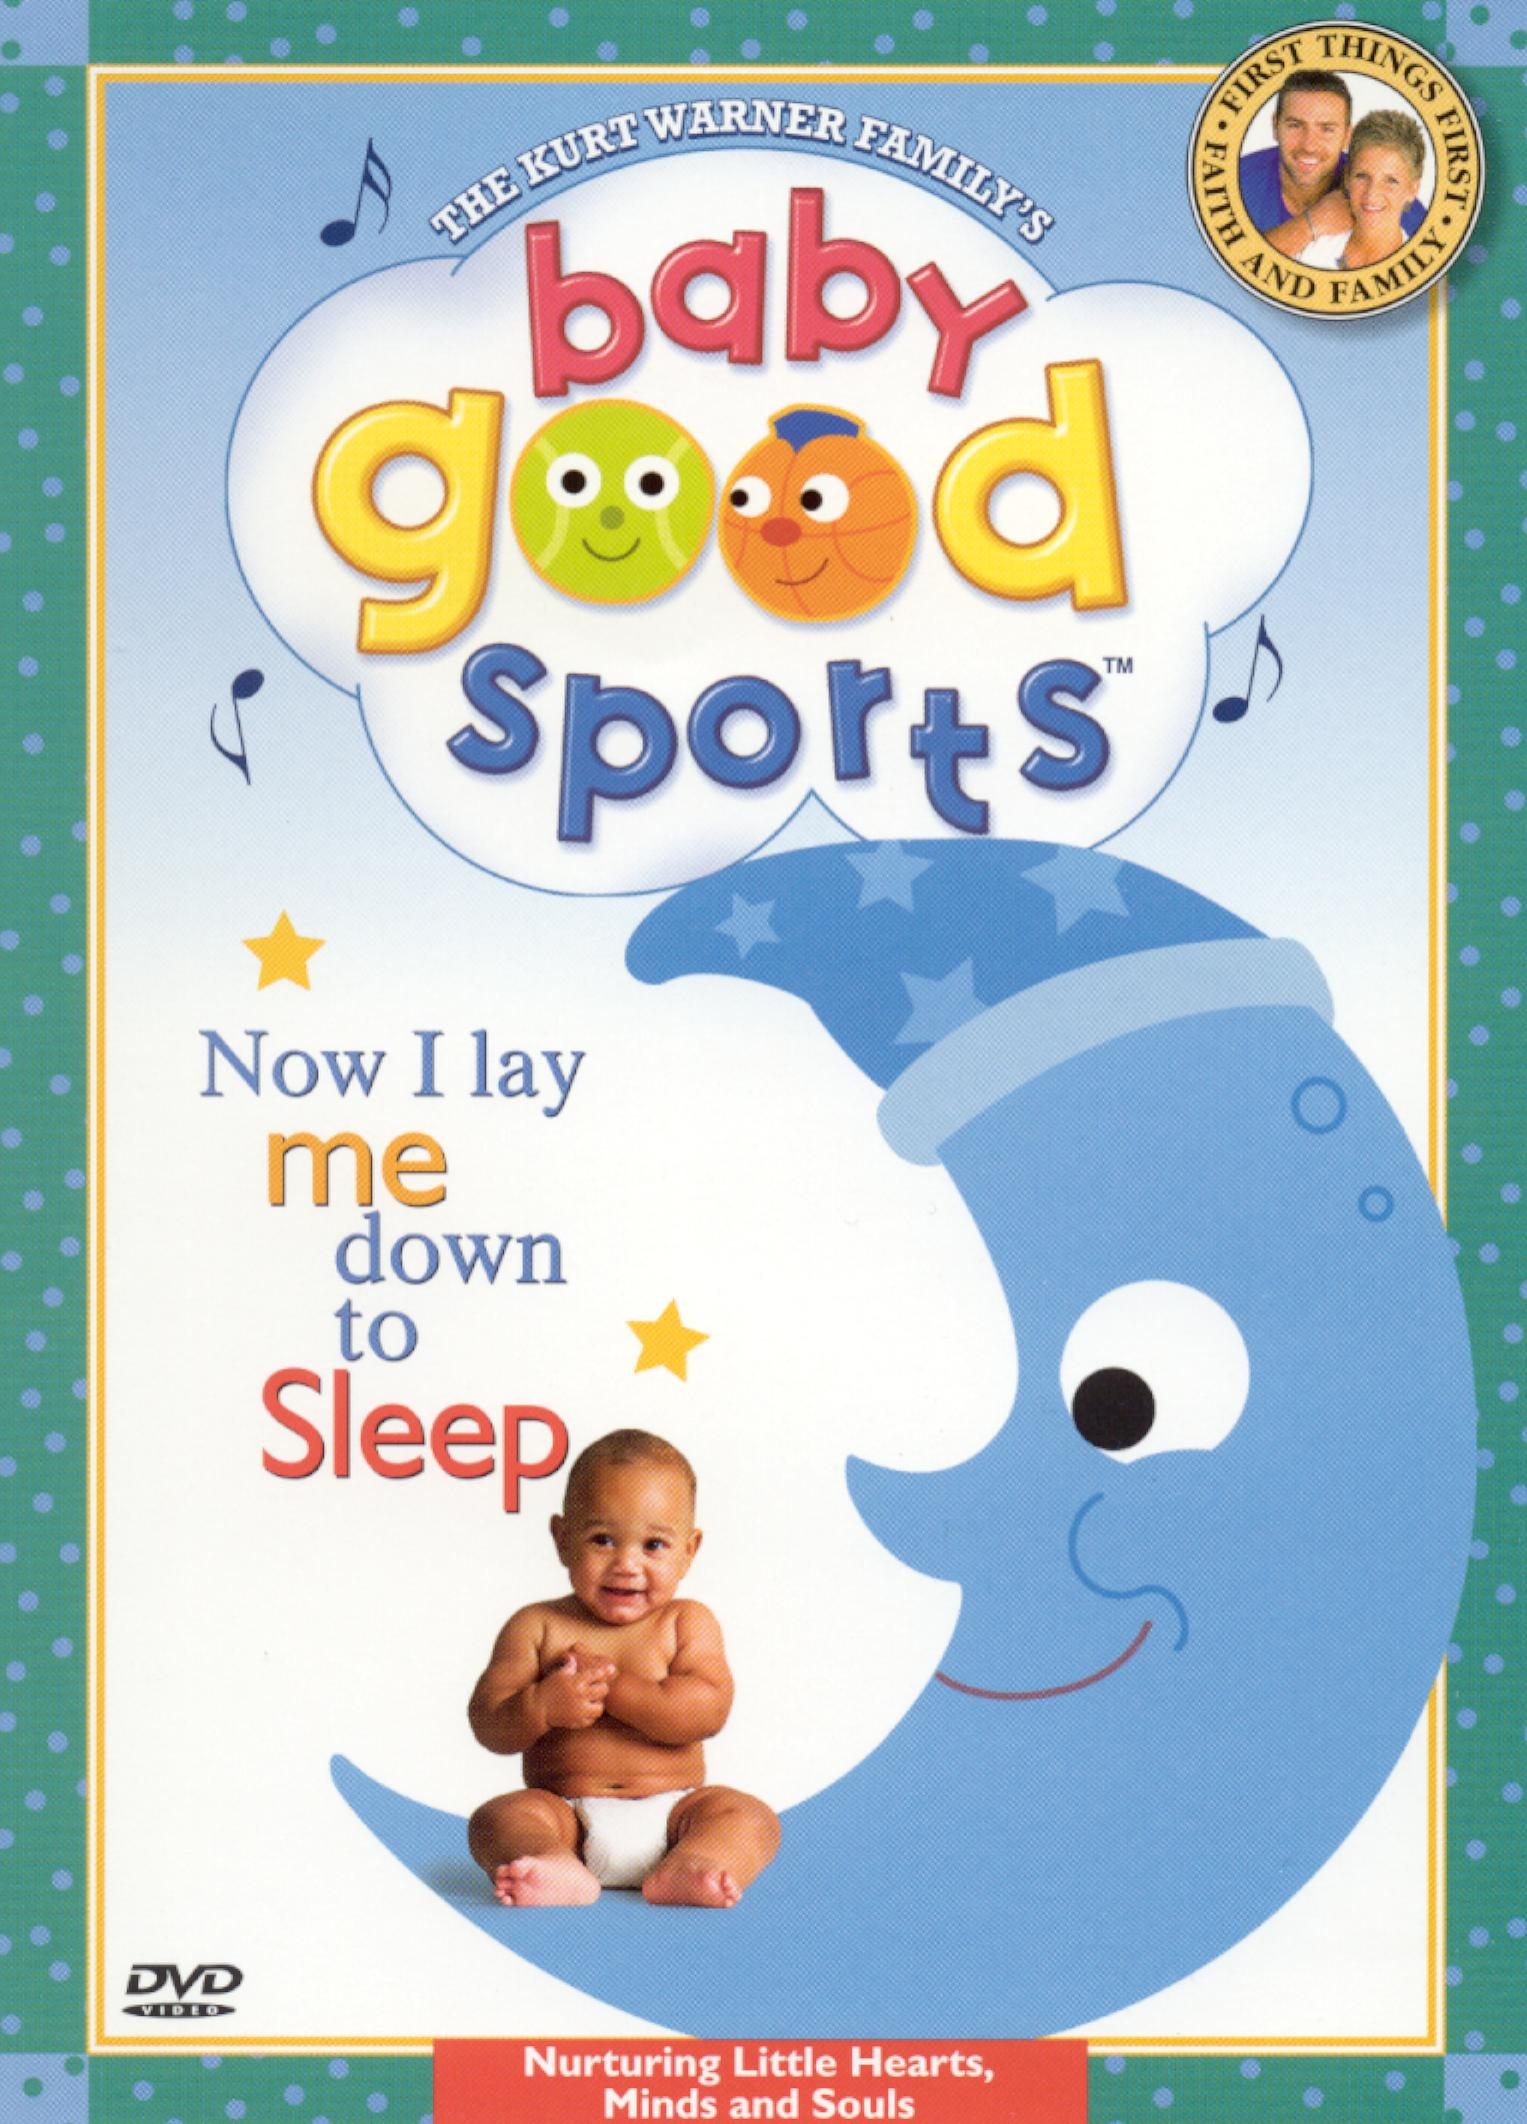 Baby Good Sports: Now I Lay Me Down to Sleep